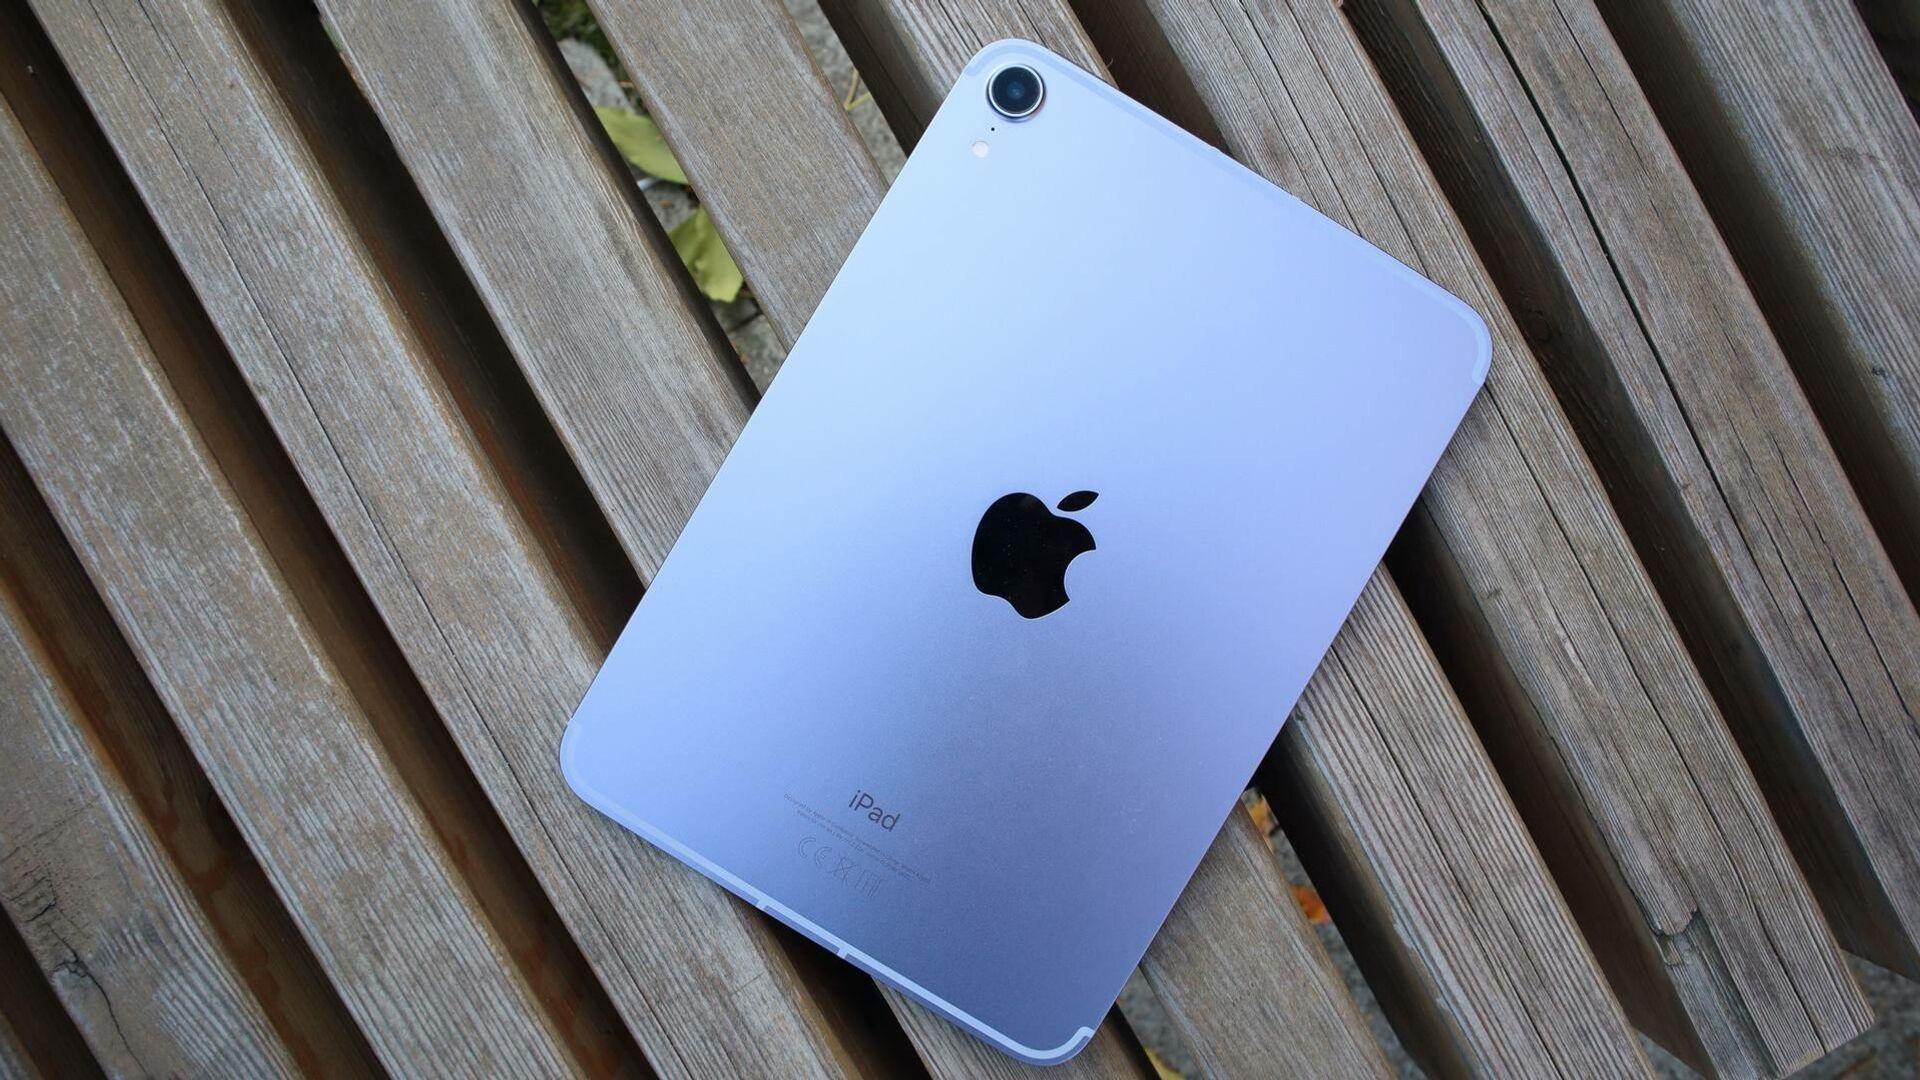 Мощное железо: экспертиза маленького планшета iPad mini 6 от Apple